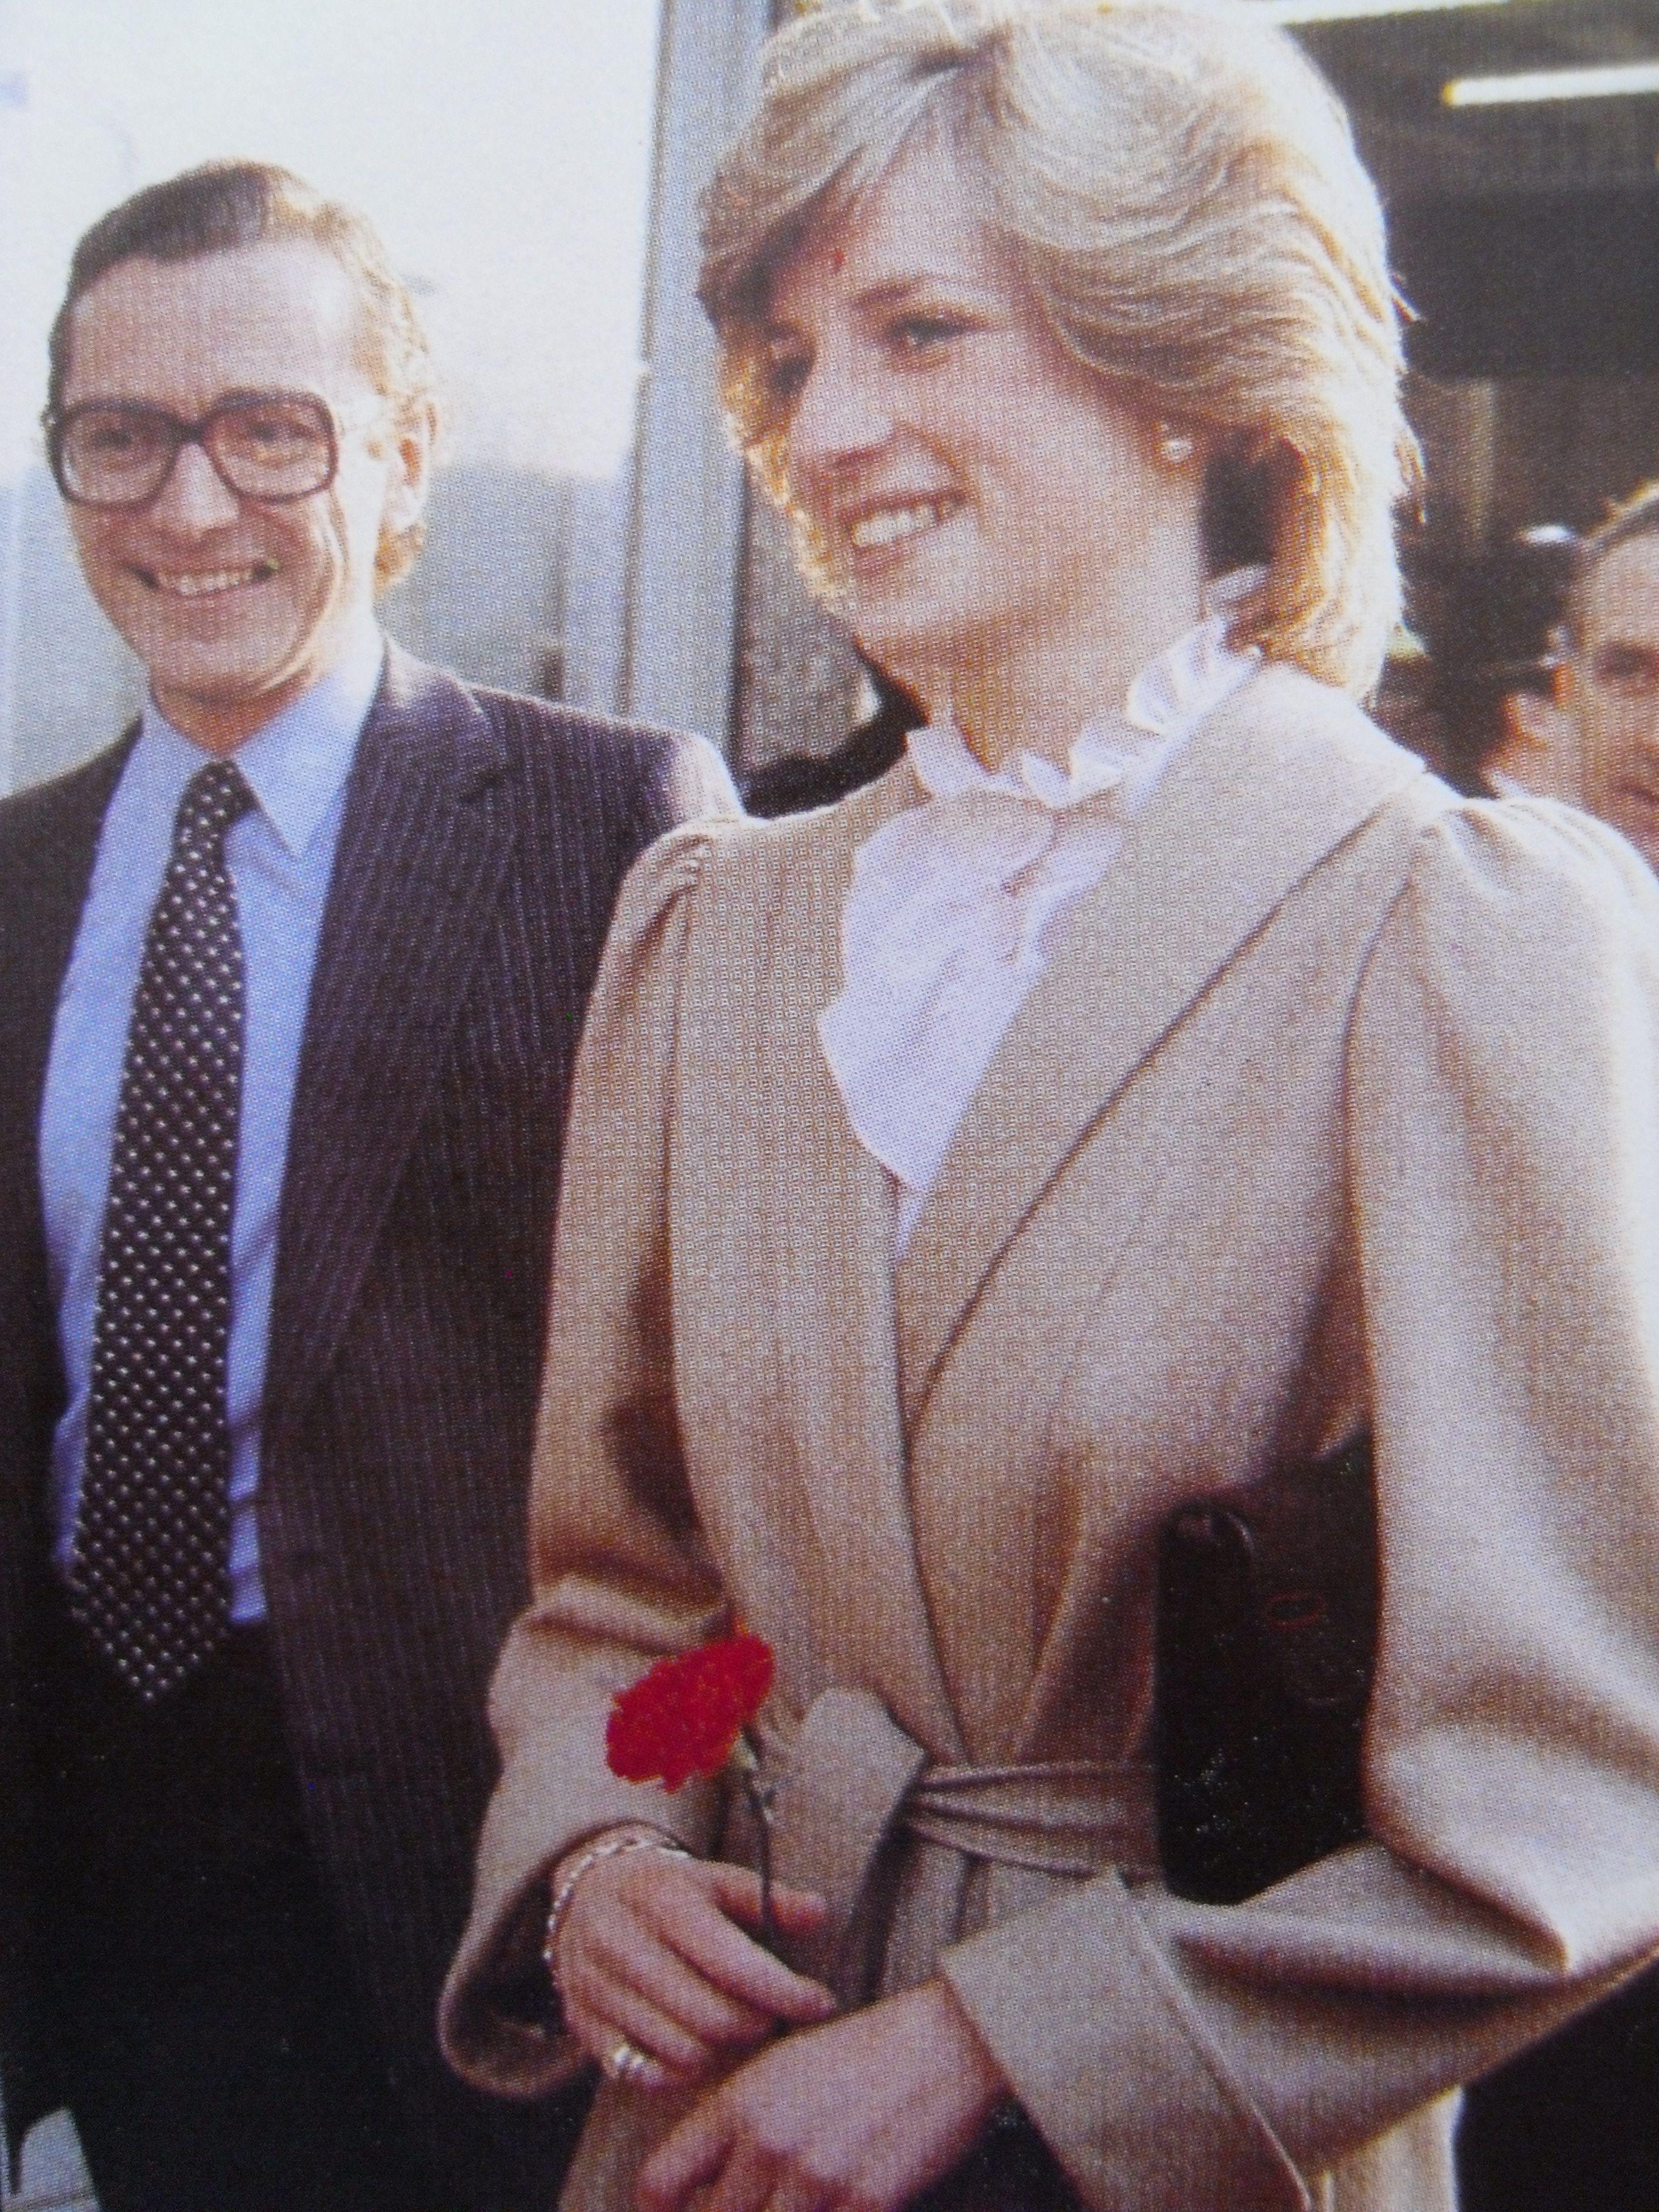 Princess Diana Lady diana, Princess diana, Diana